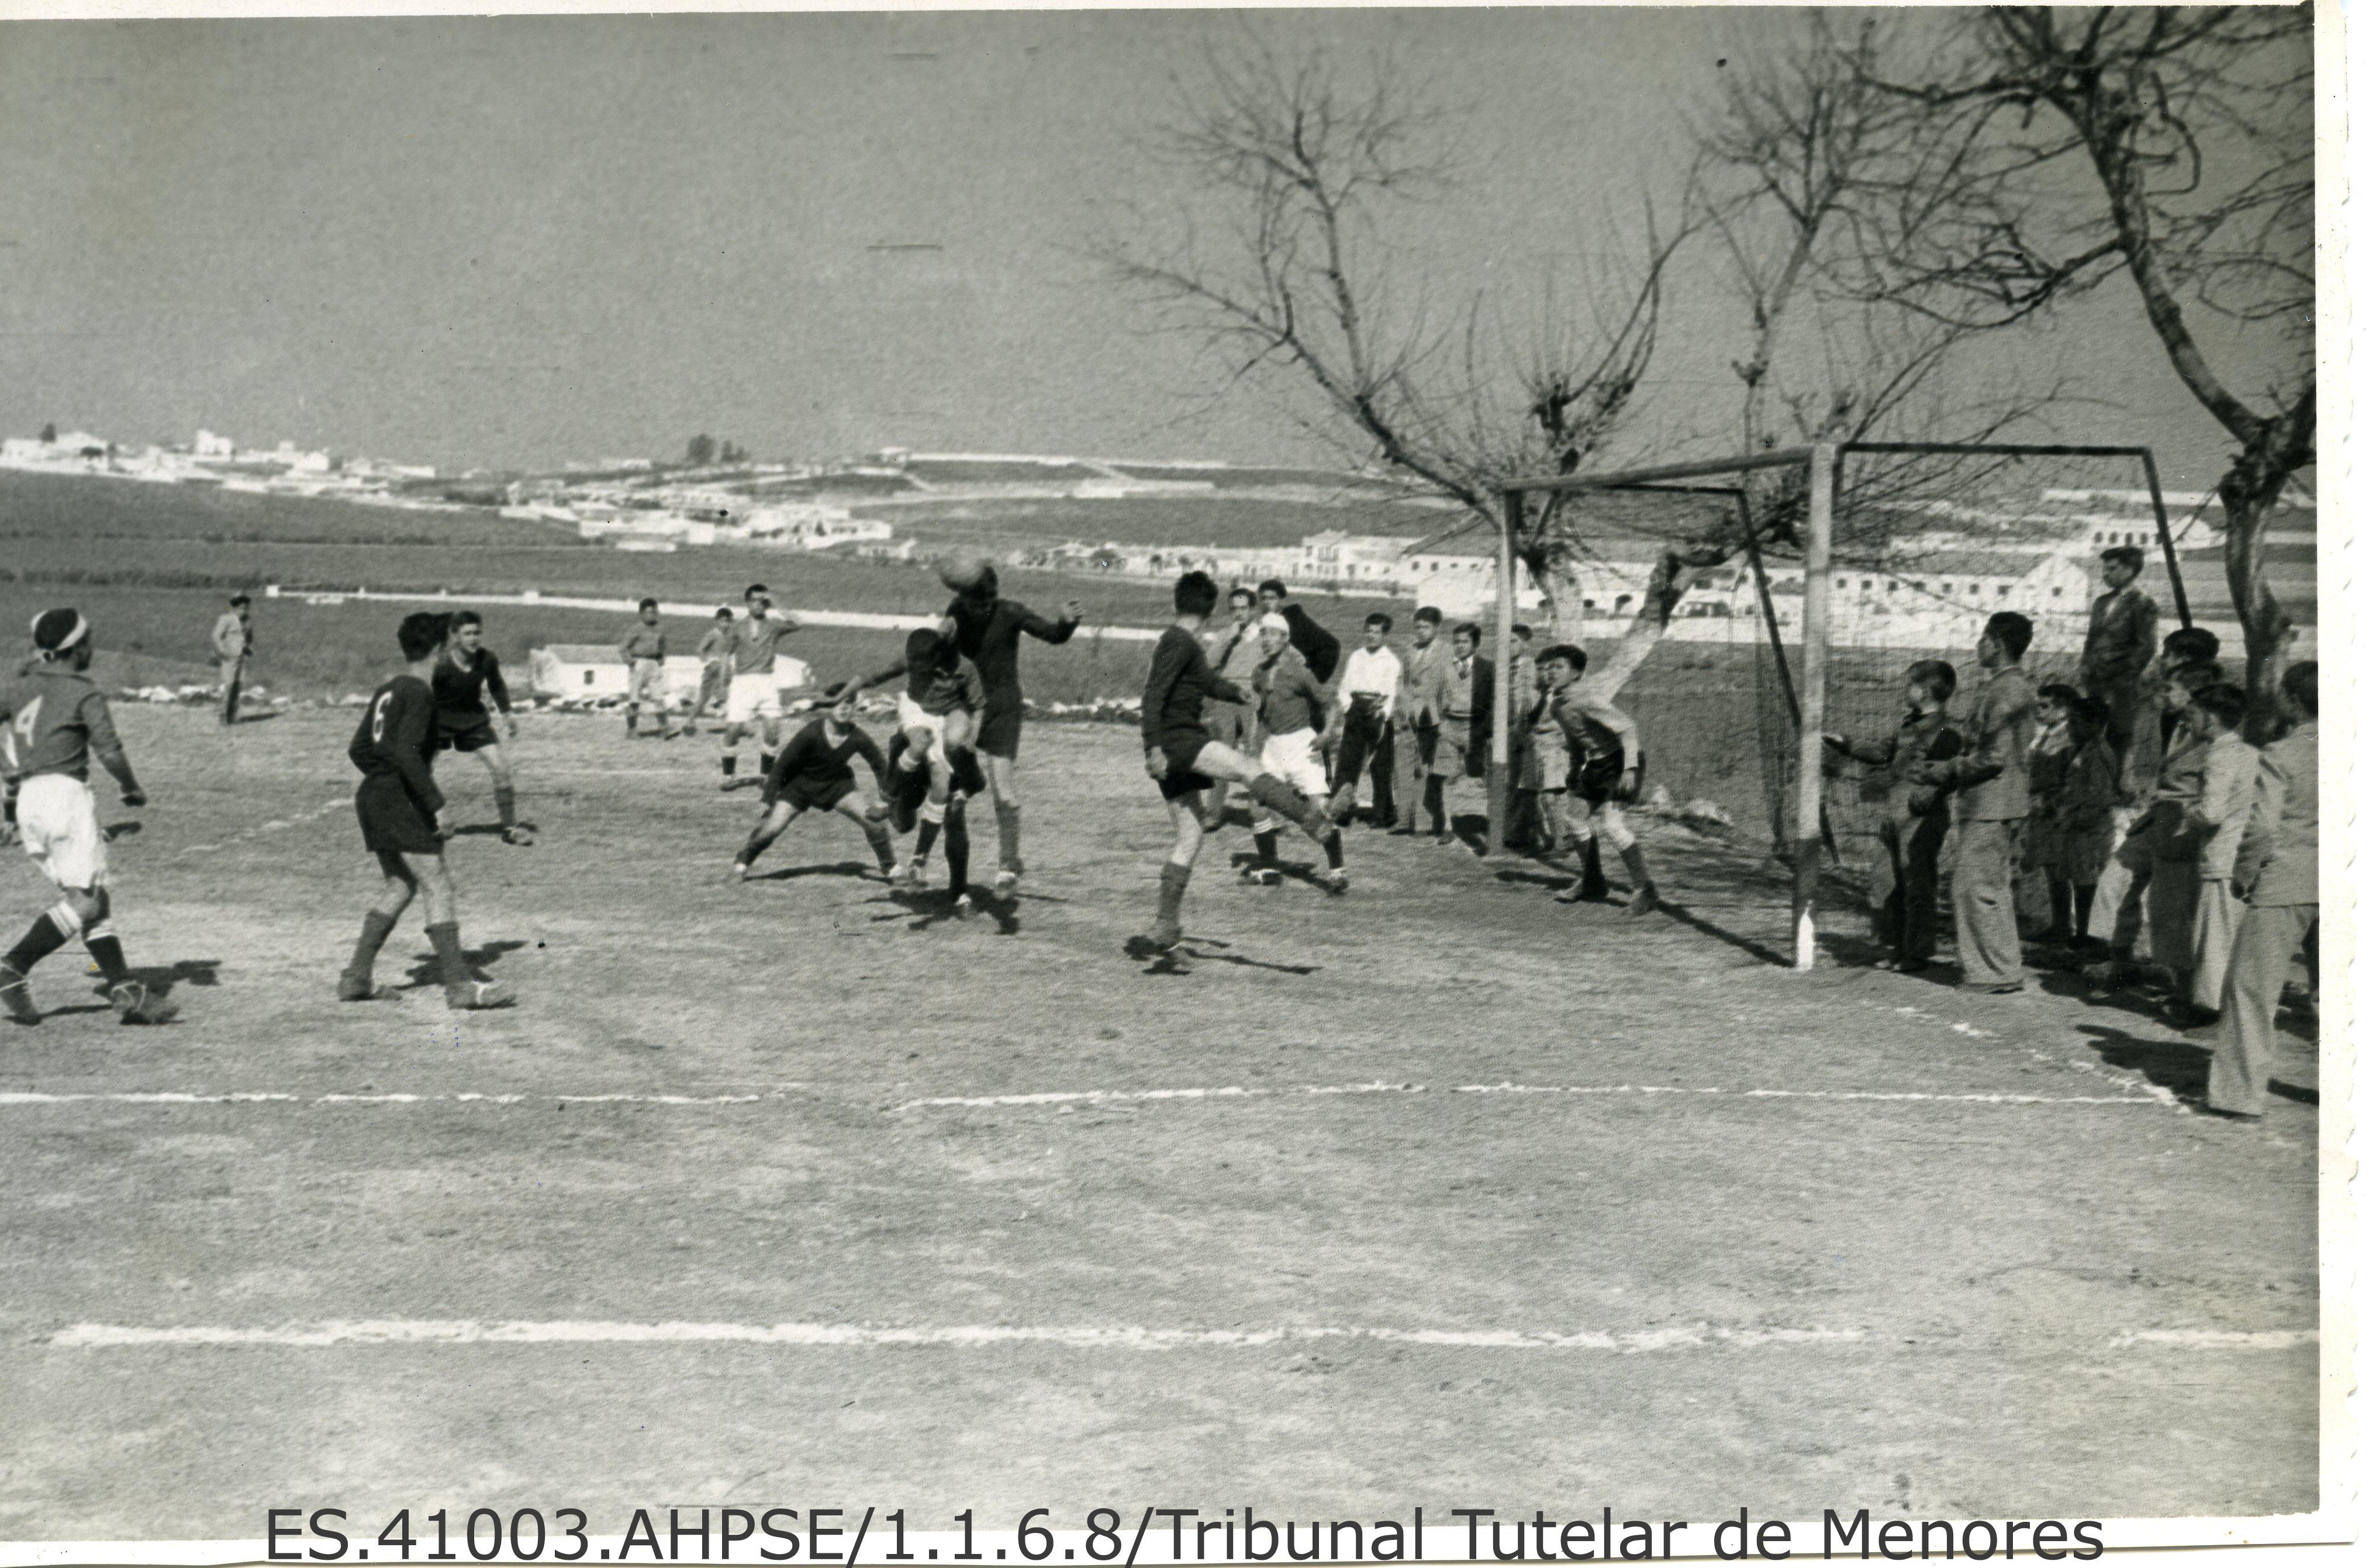 Partido de fútbol. Casa Tutelar San Francisco de Paula. fondo Tribunal Tutelar de Menores. 1955